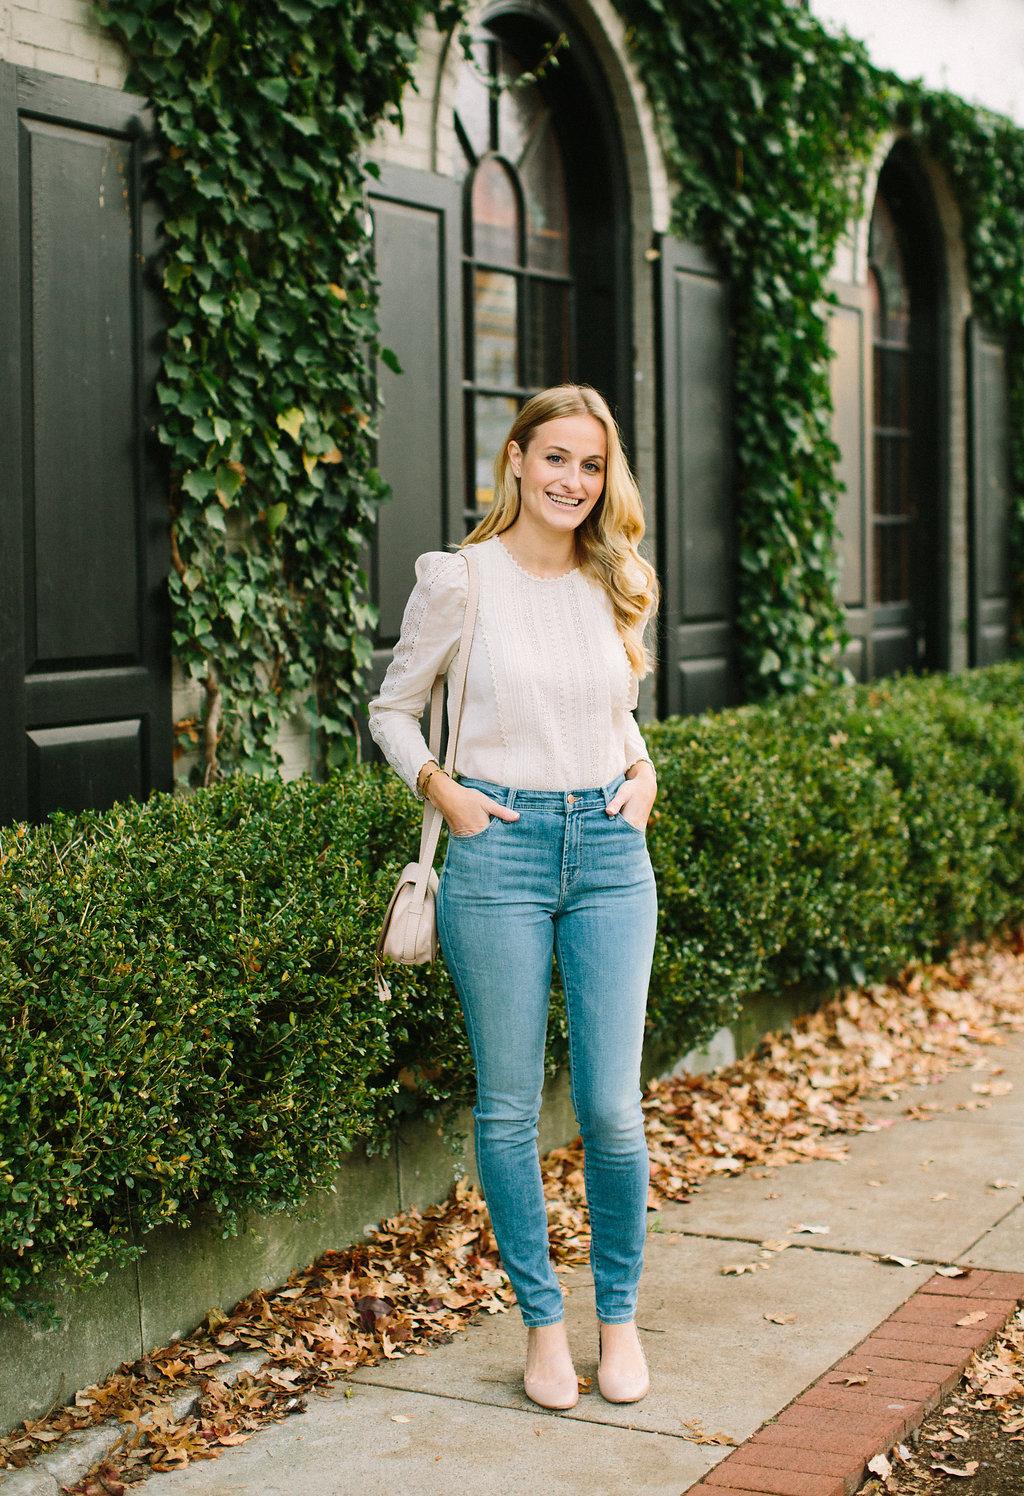 StephanieTrotta-TheGirlGuide-LindsayMaddenPhotography-Rebeccataylor.jpg